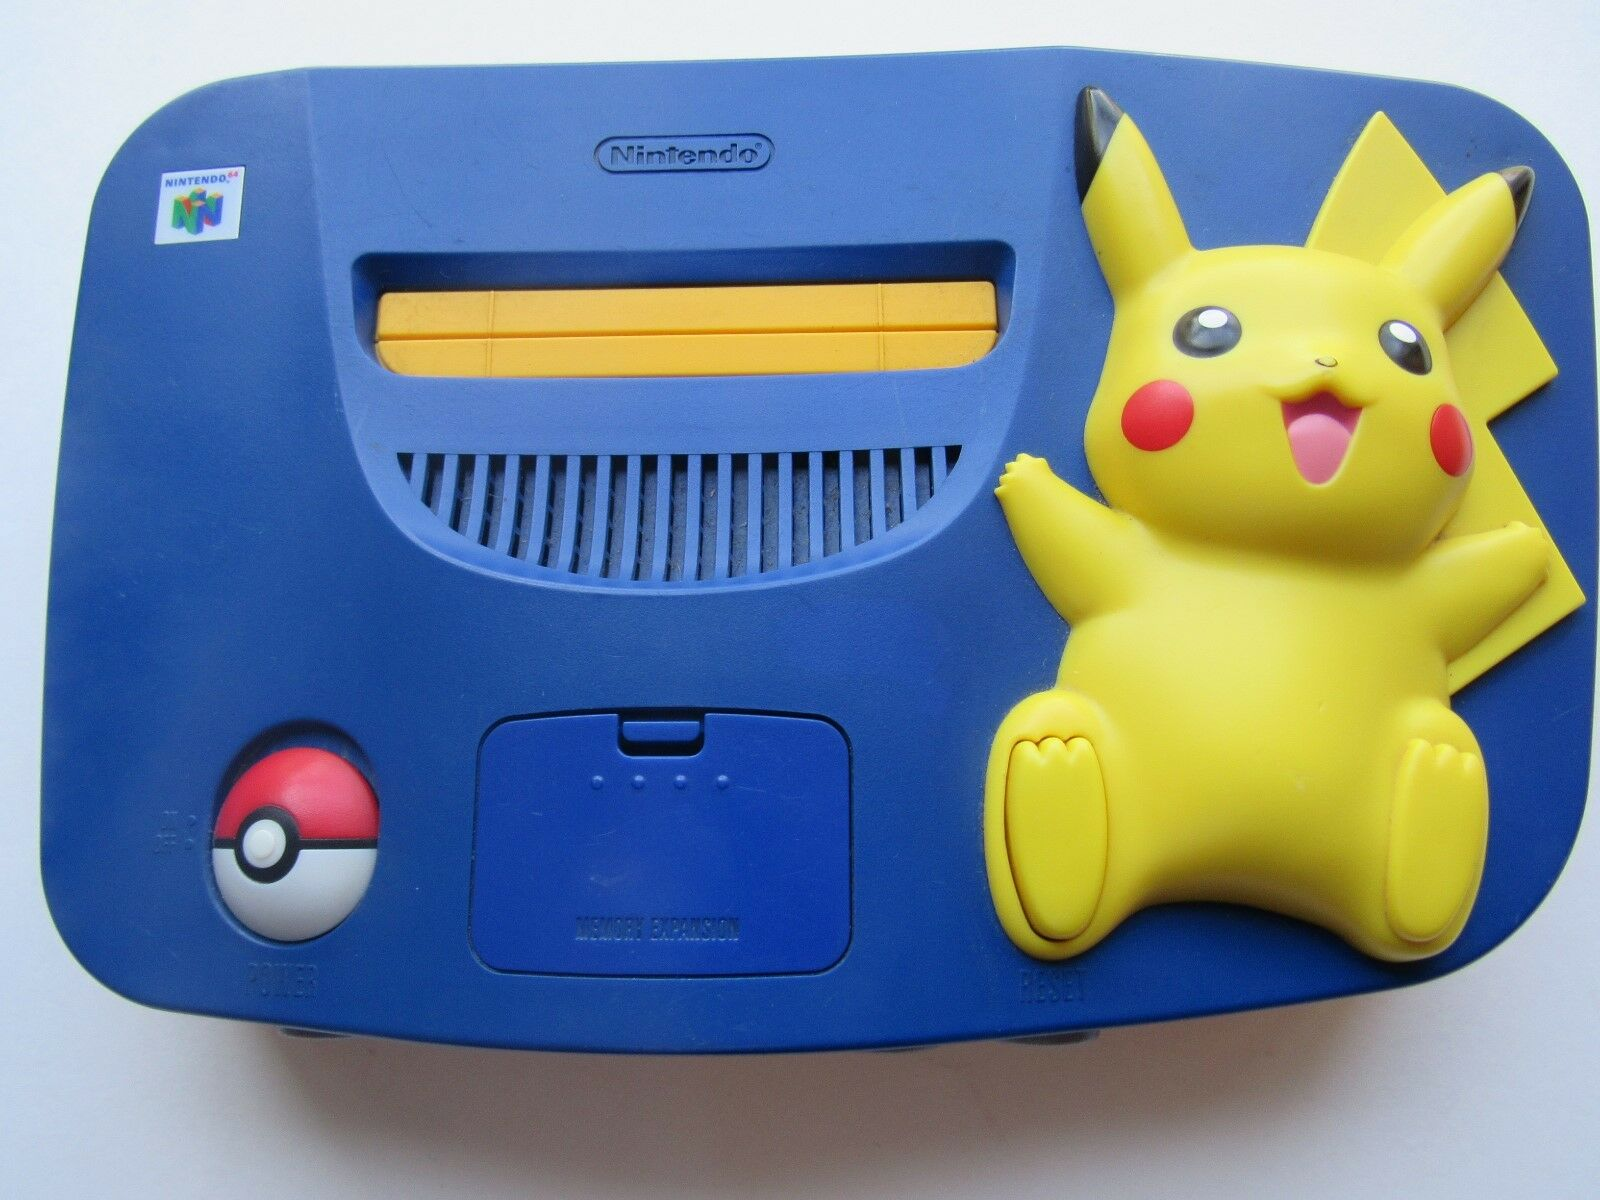 *GOOD* Nintendo 64 N64 OEM Video Game Console System Funtastic Pokemon Gold Rare Pikachu Pokemon *Console & Jumper* TOYS R US